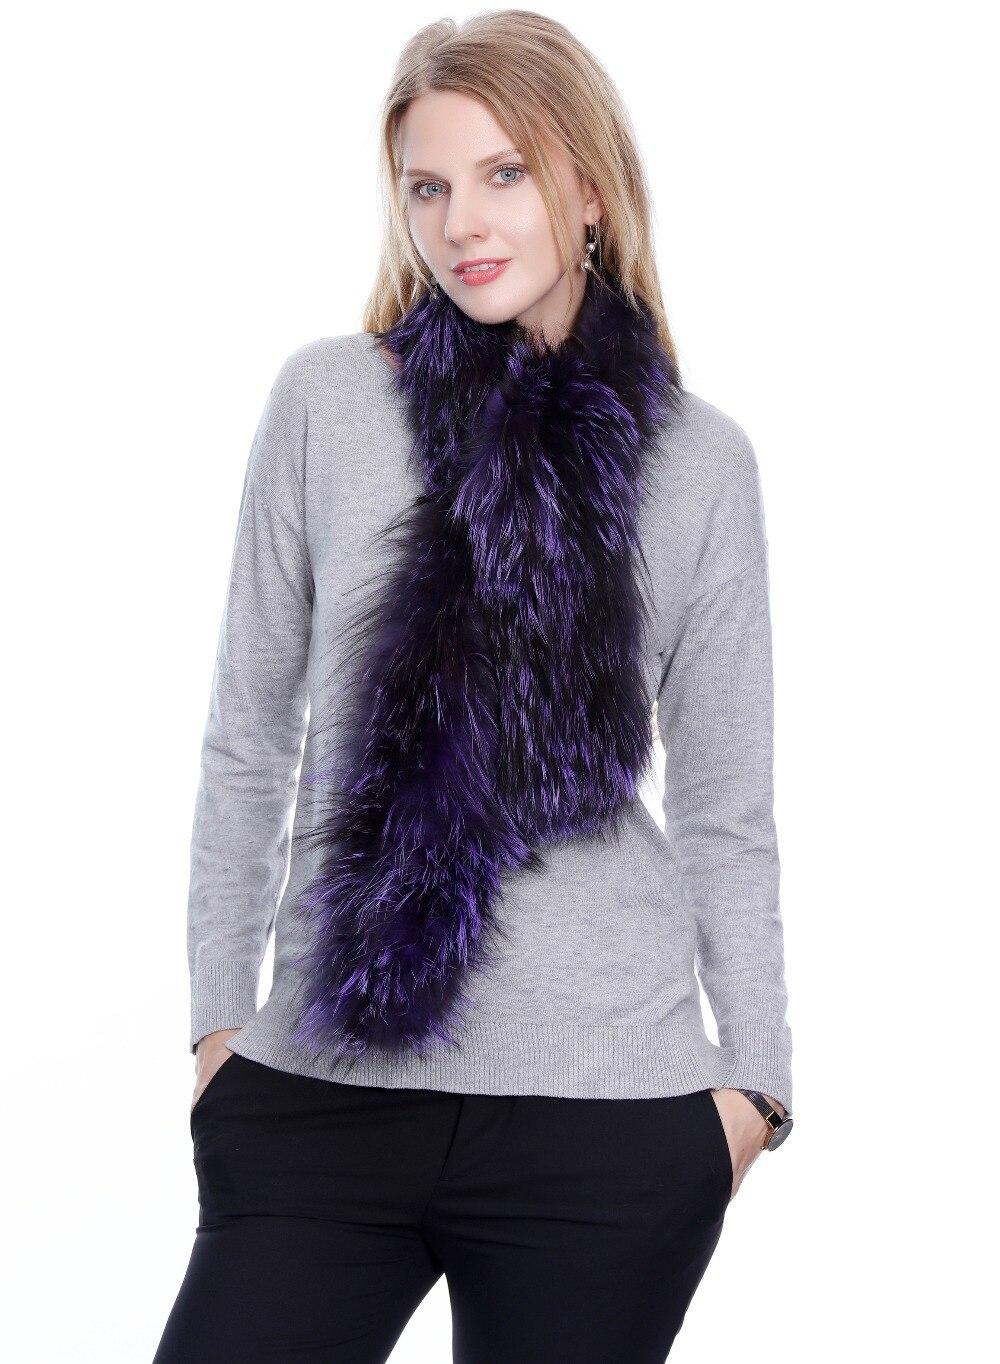 8bc2748e6a New-arrival-lady-fashion -natural-fox-fur-scarf-autumn-and-winter-warm-fur-muffler-elegant-fox.jpg